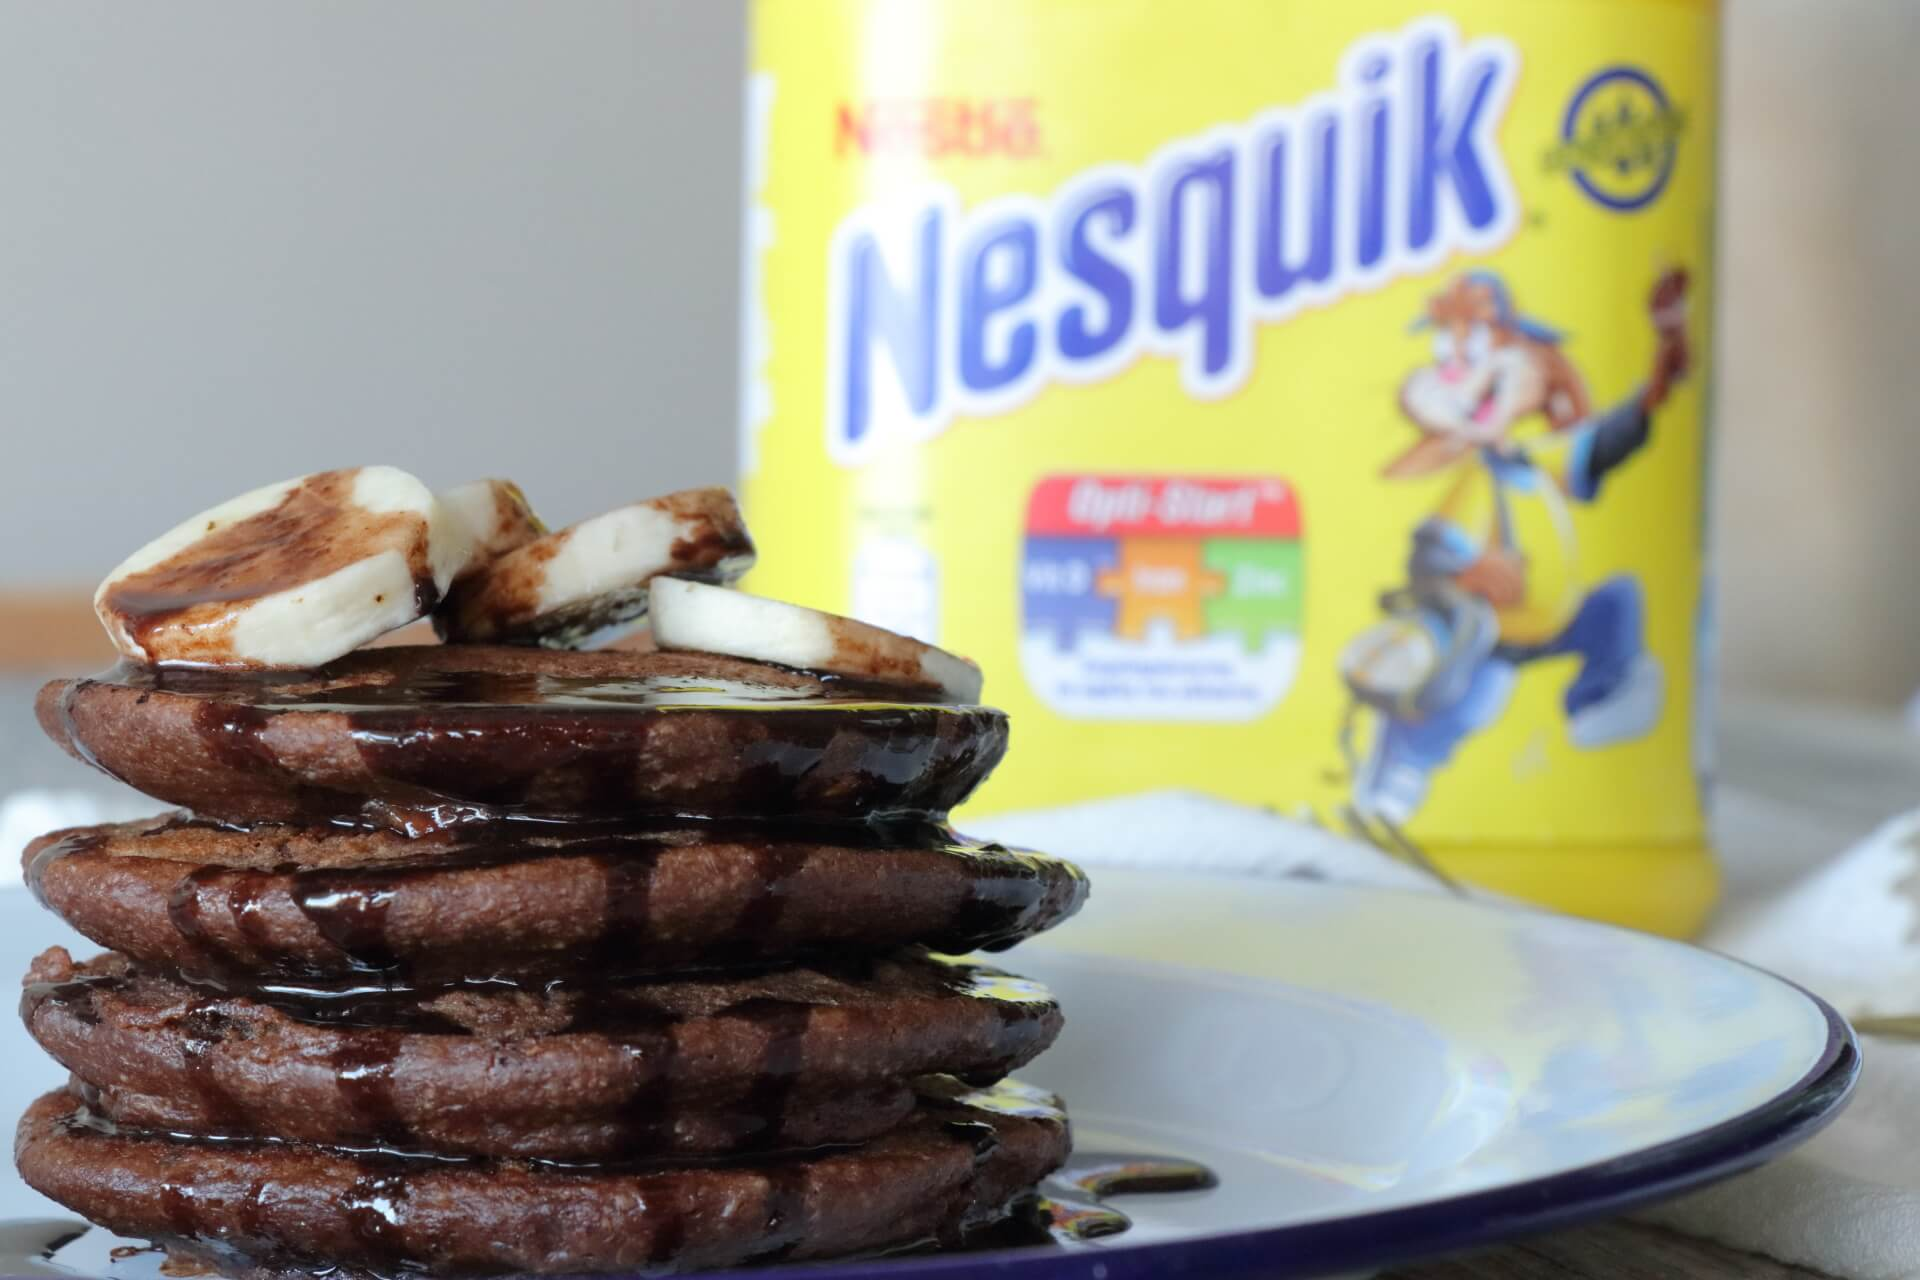 SQSP_Σοκολατένια pancakes γεμιστά με μαρμελάδα_IMG_0851_1.JPG